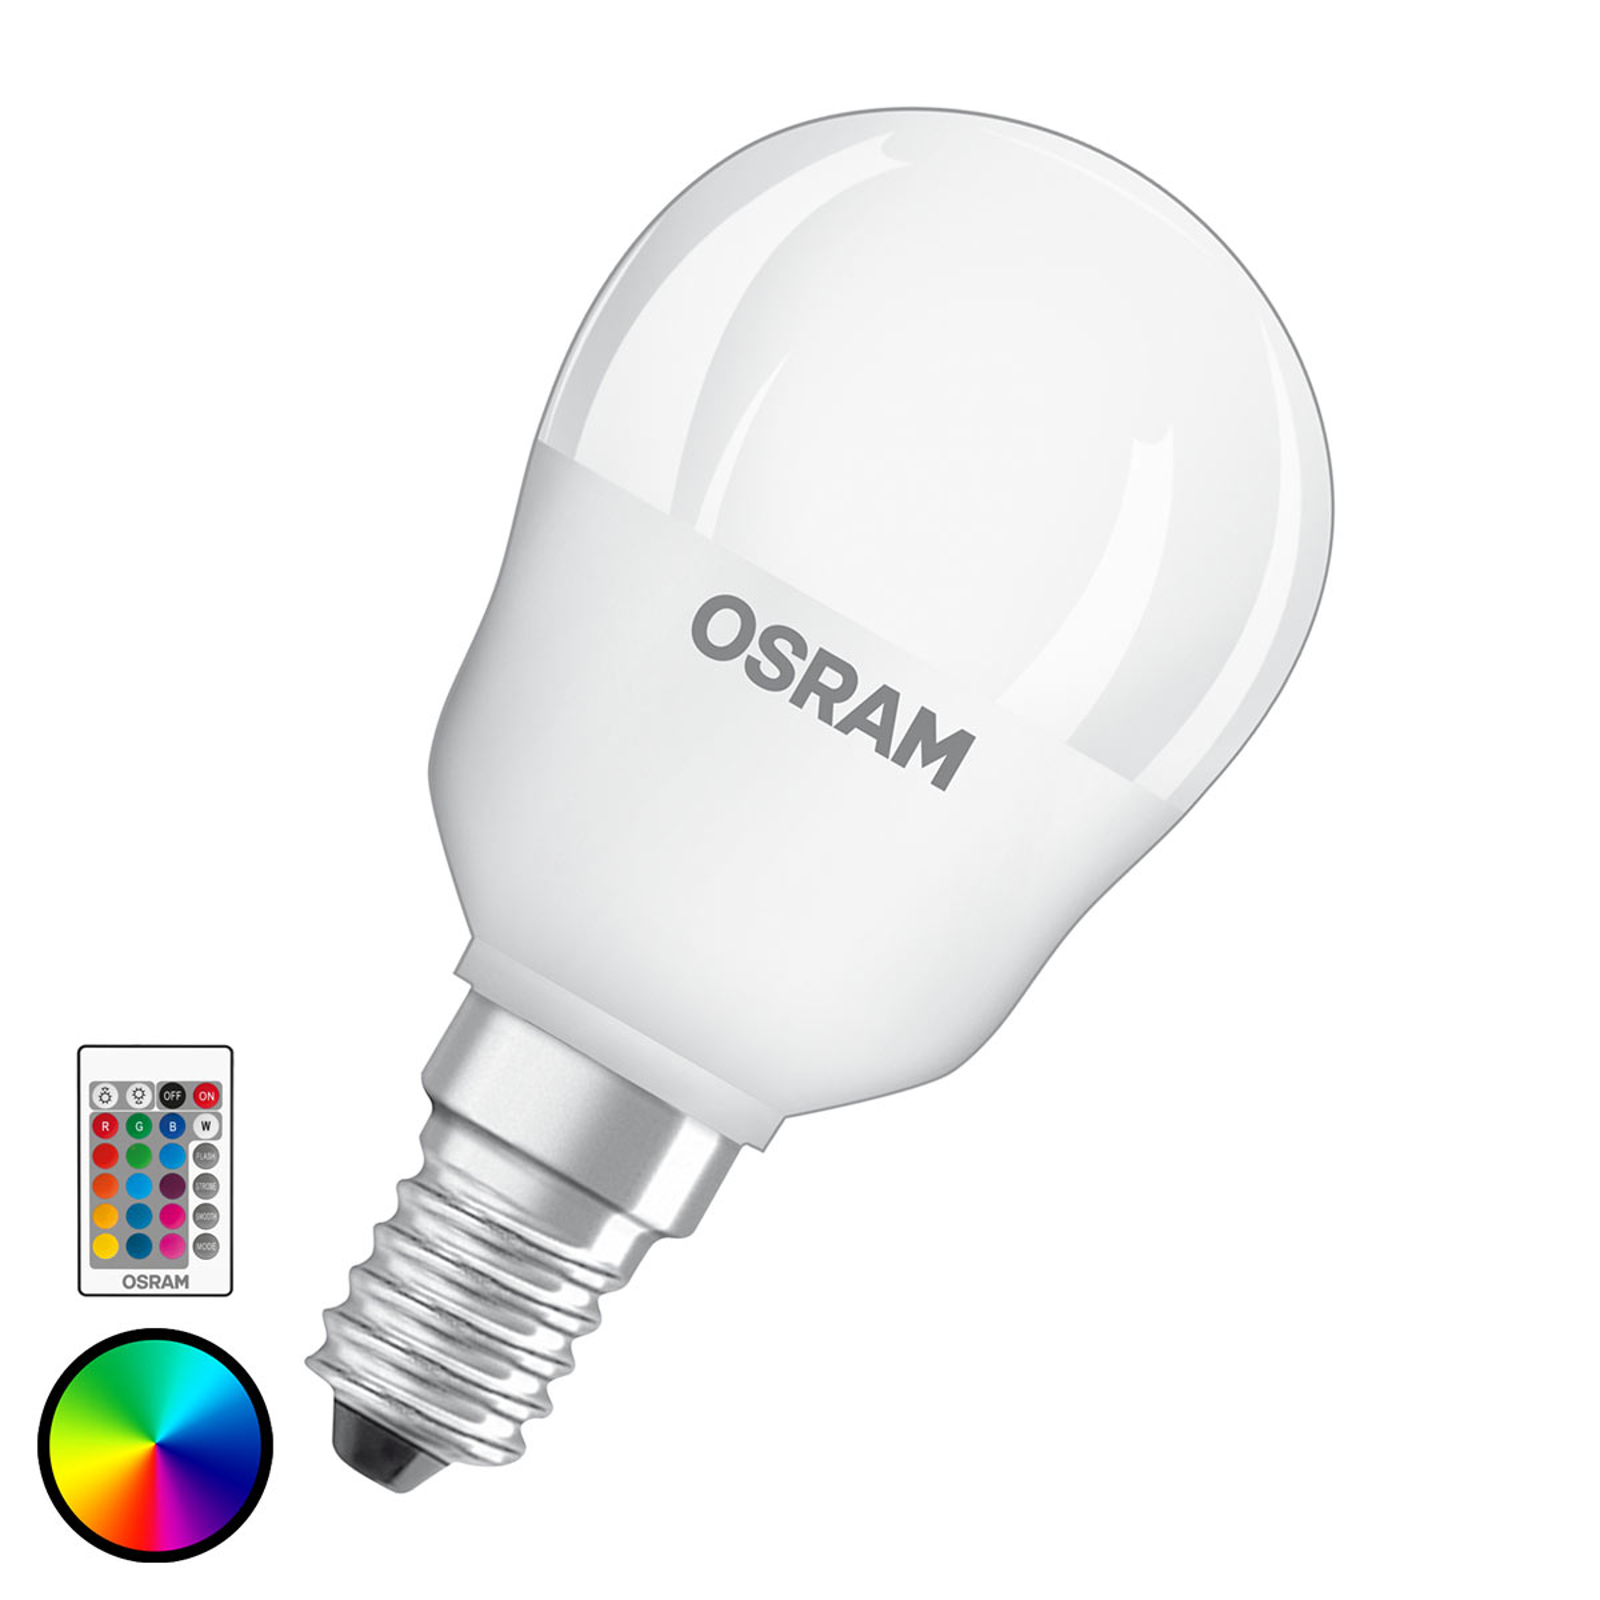 OSRAM ampoule LED E14 4,5W Star+ goutte remote mat